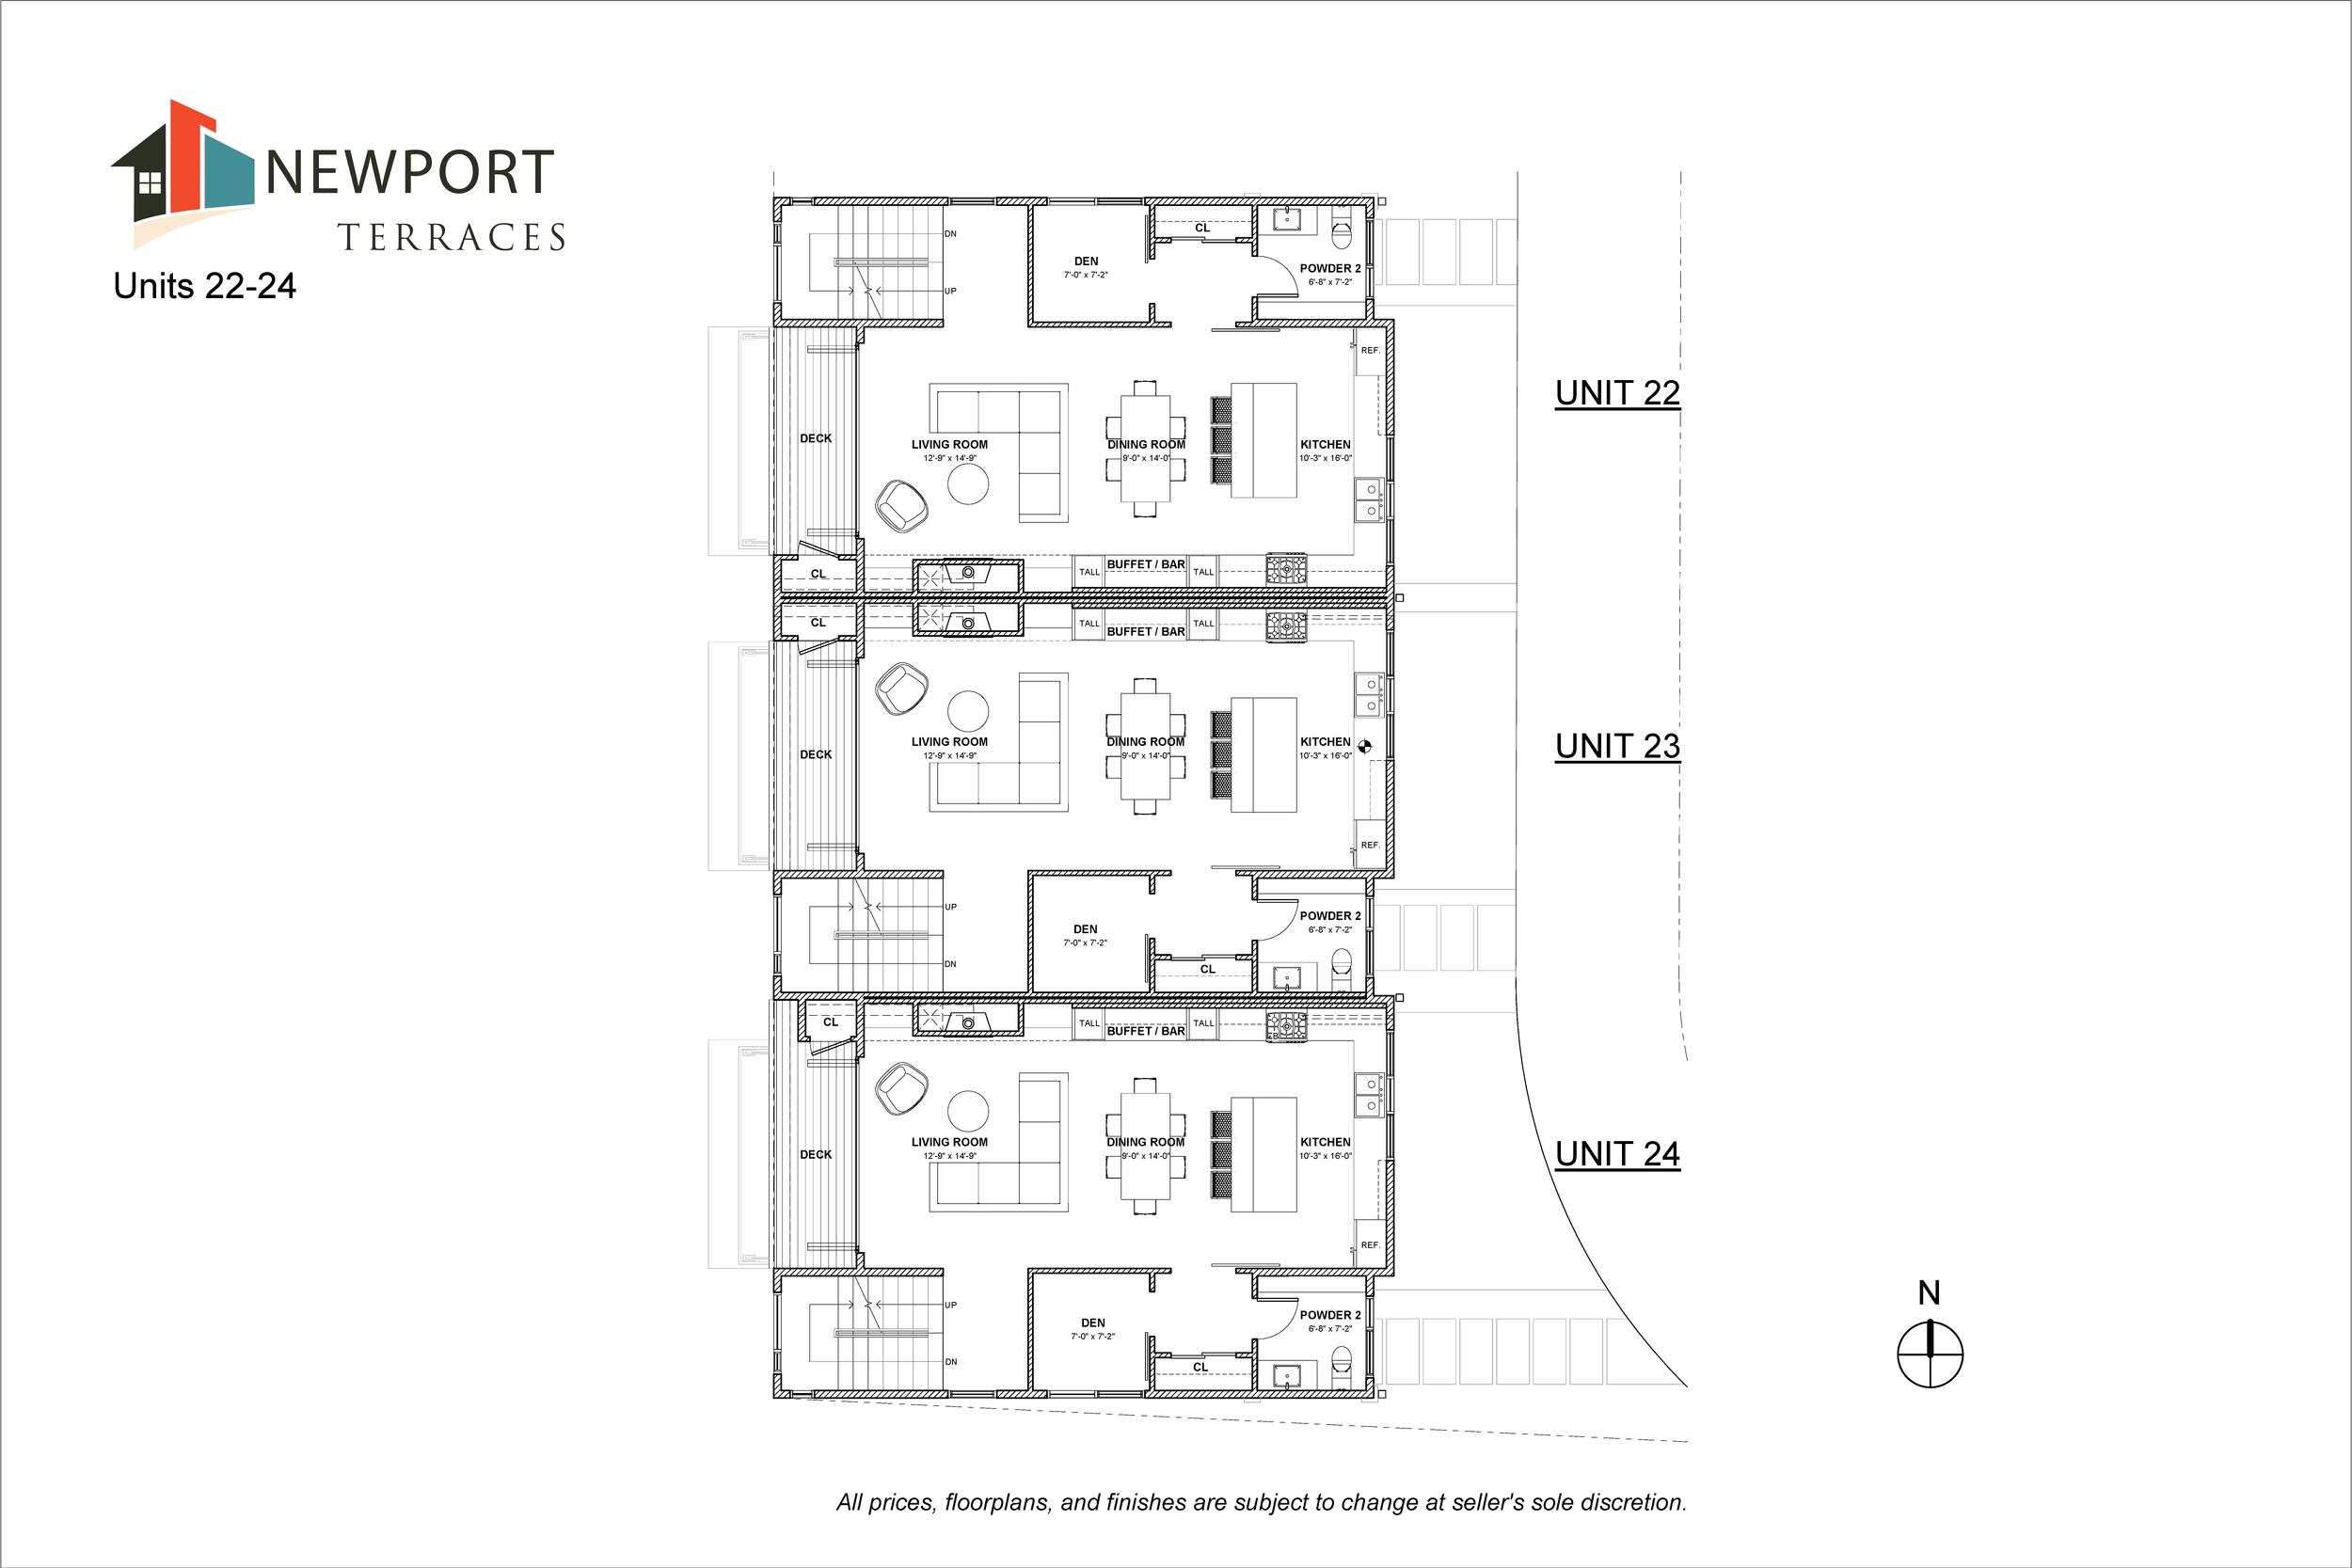 Newport Floorplans L22 L23 L24_Page_3.png